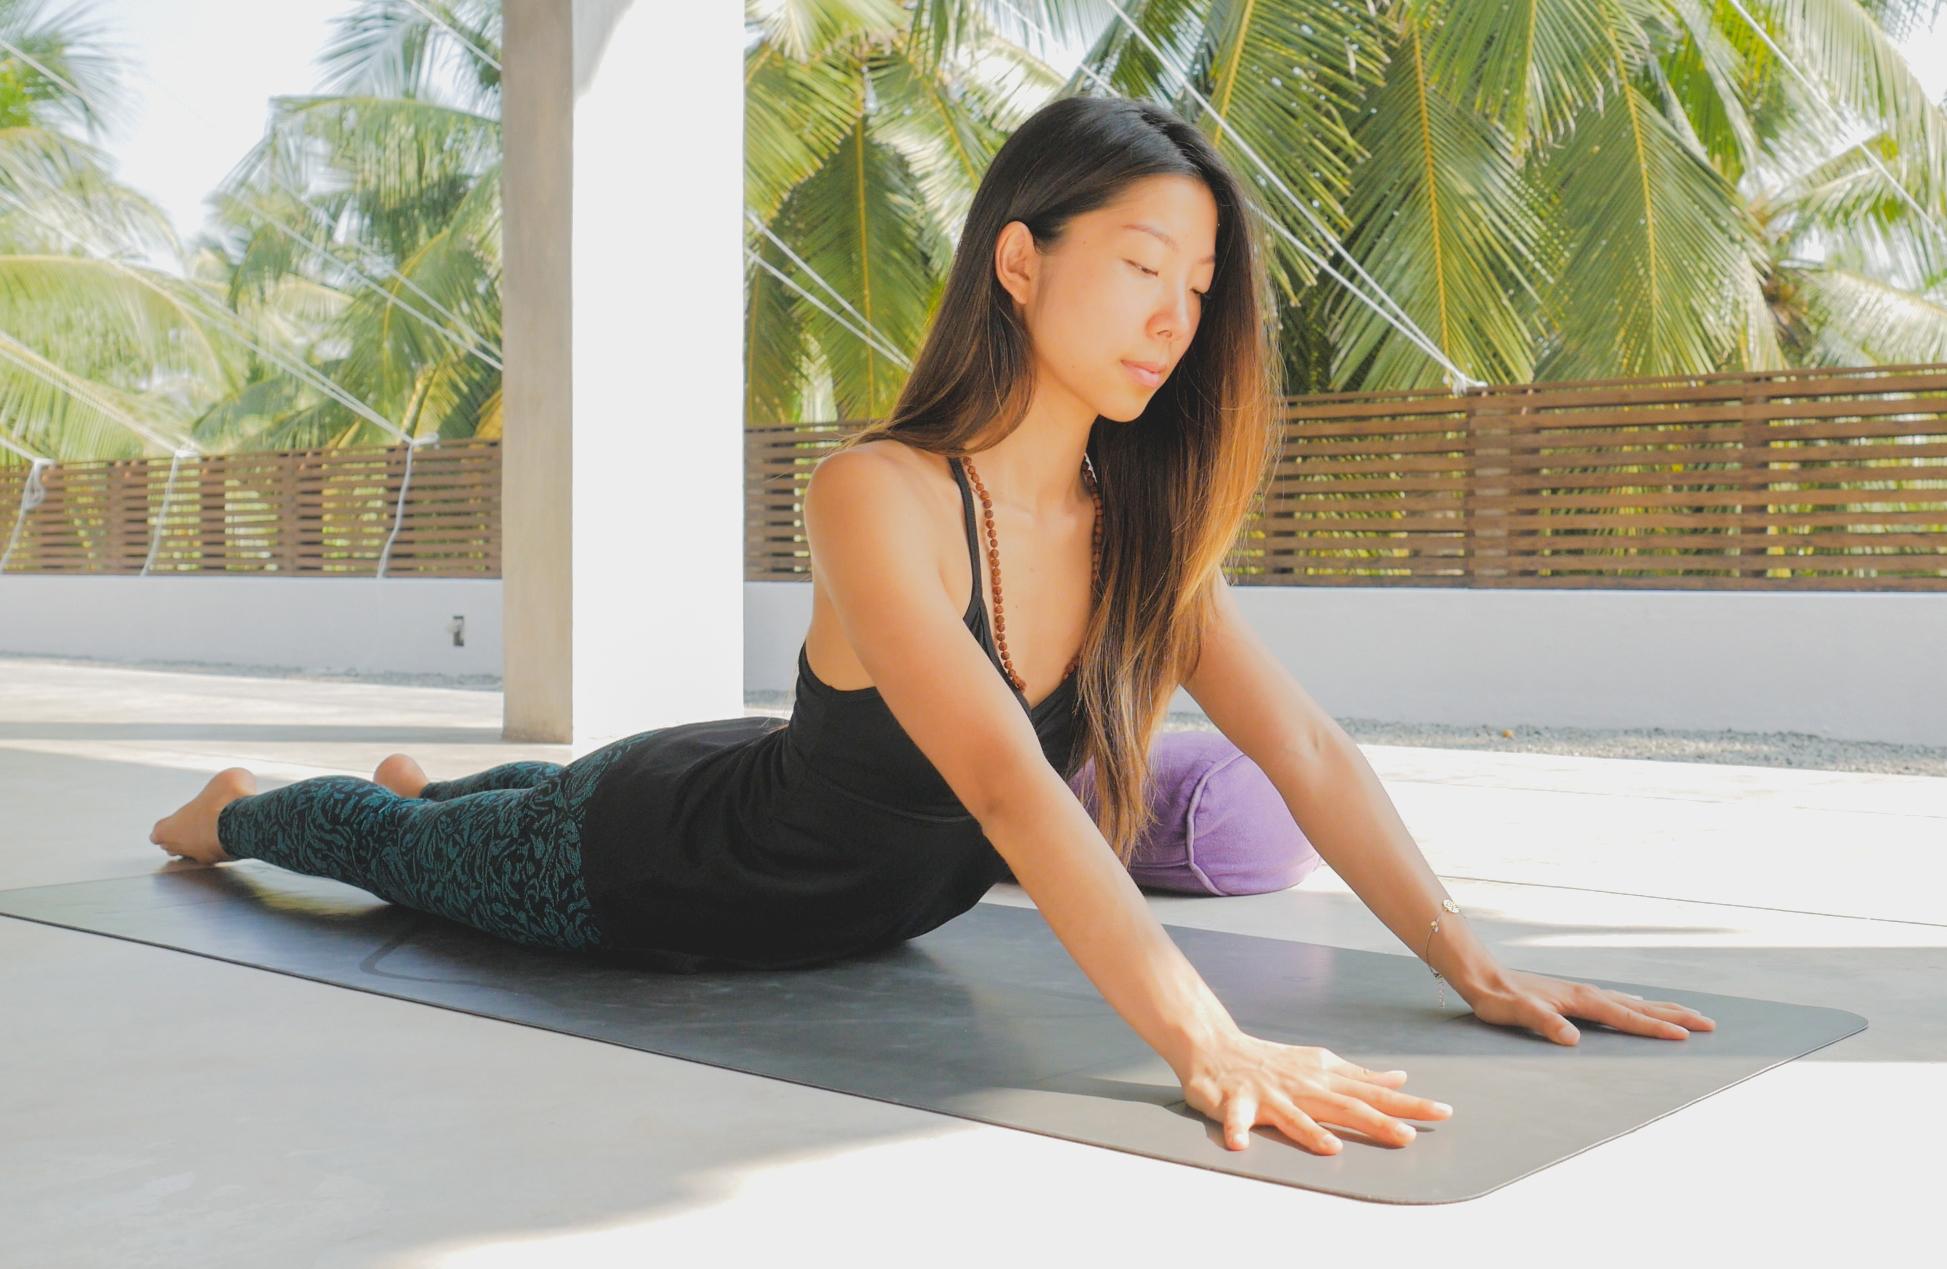 Йога для начинающих видео уроки в домашних условиях смотреть